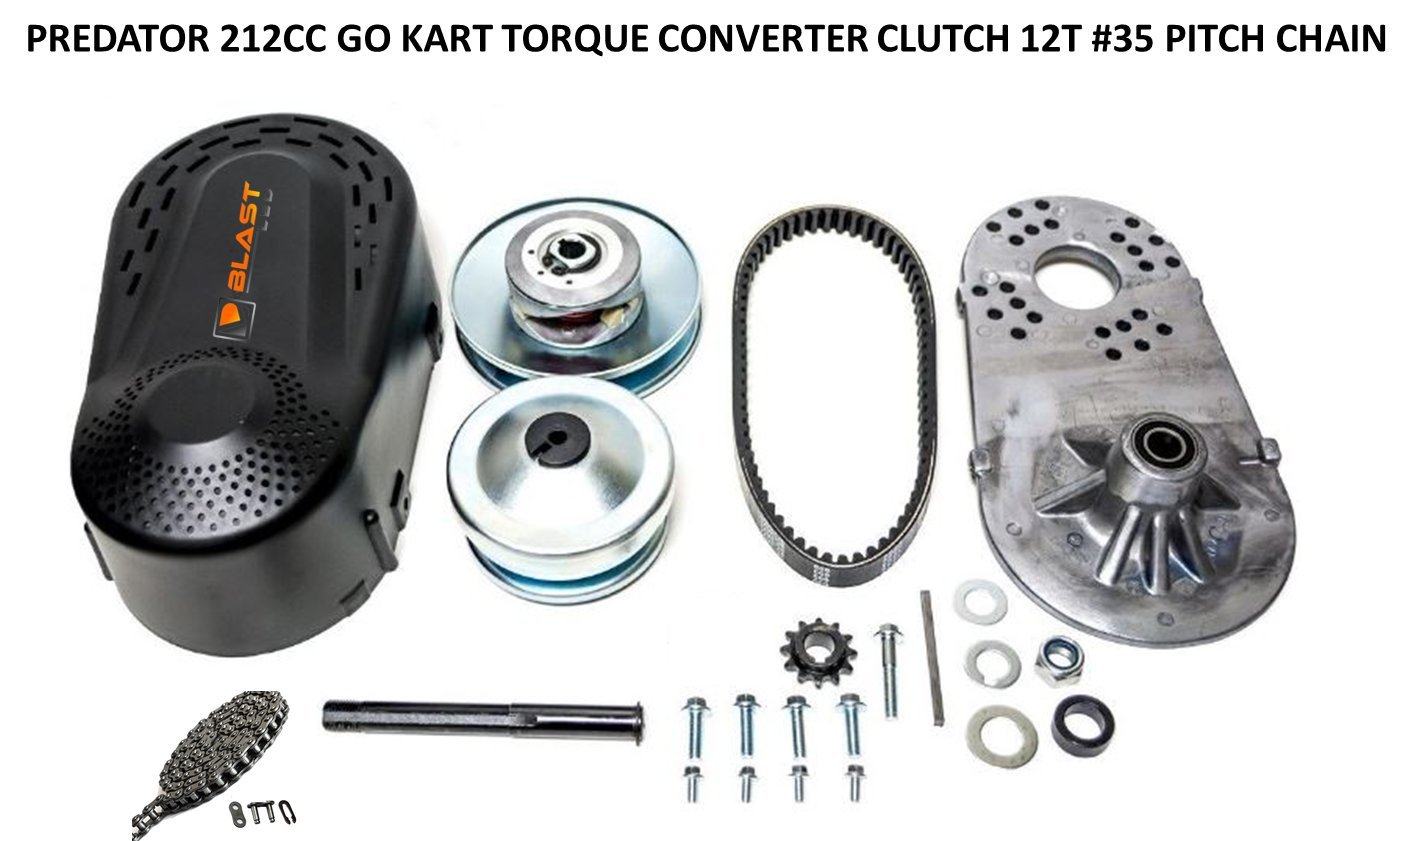 BLAST LED - Predator 212CC GO Kart Torque Converter Clutch 35 Pitch 12 Tooth 19.05mm 3/4' Bore + 5 FEET #35 Pitch Chain & 12T #35 Sprocket HF-212-TC